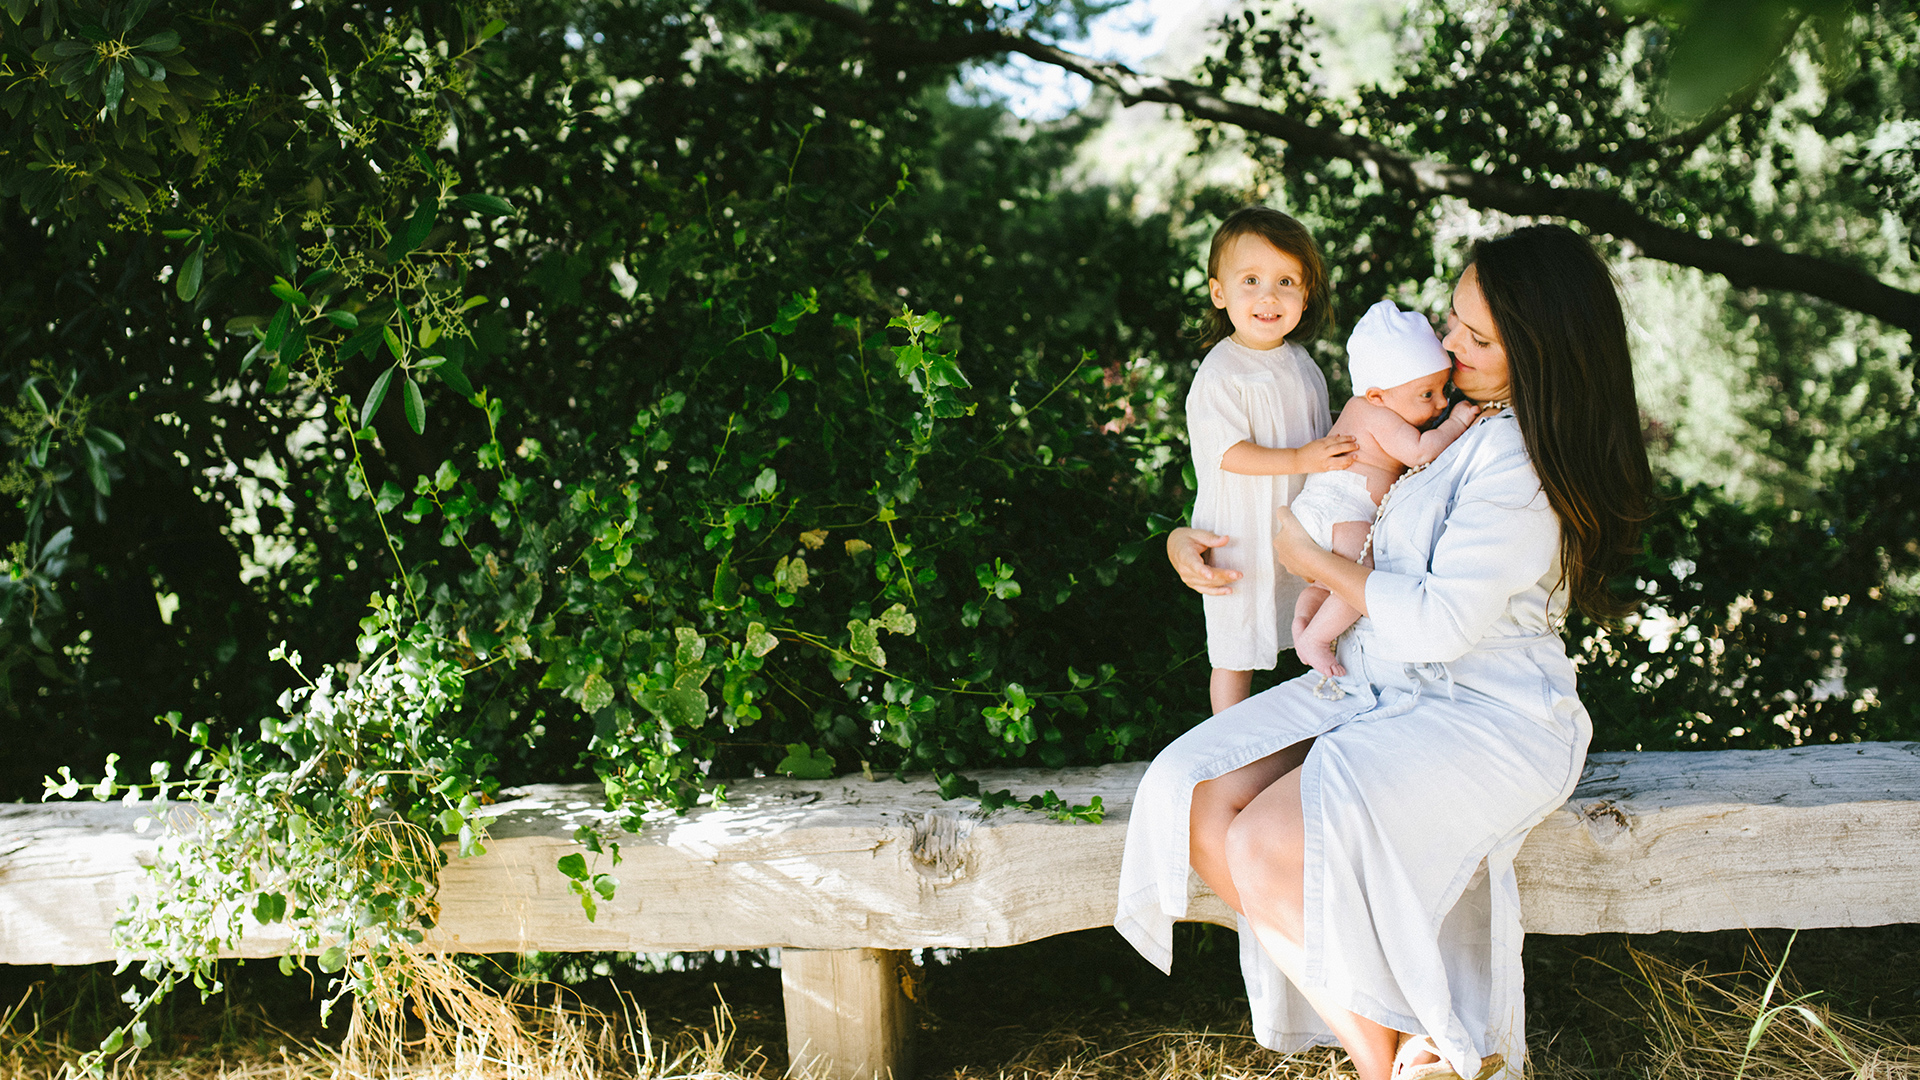 empowered birth - with SCHUYLER GRANT